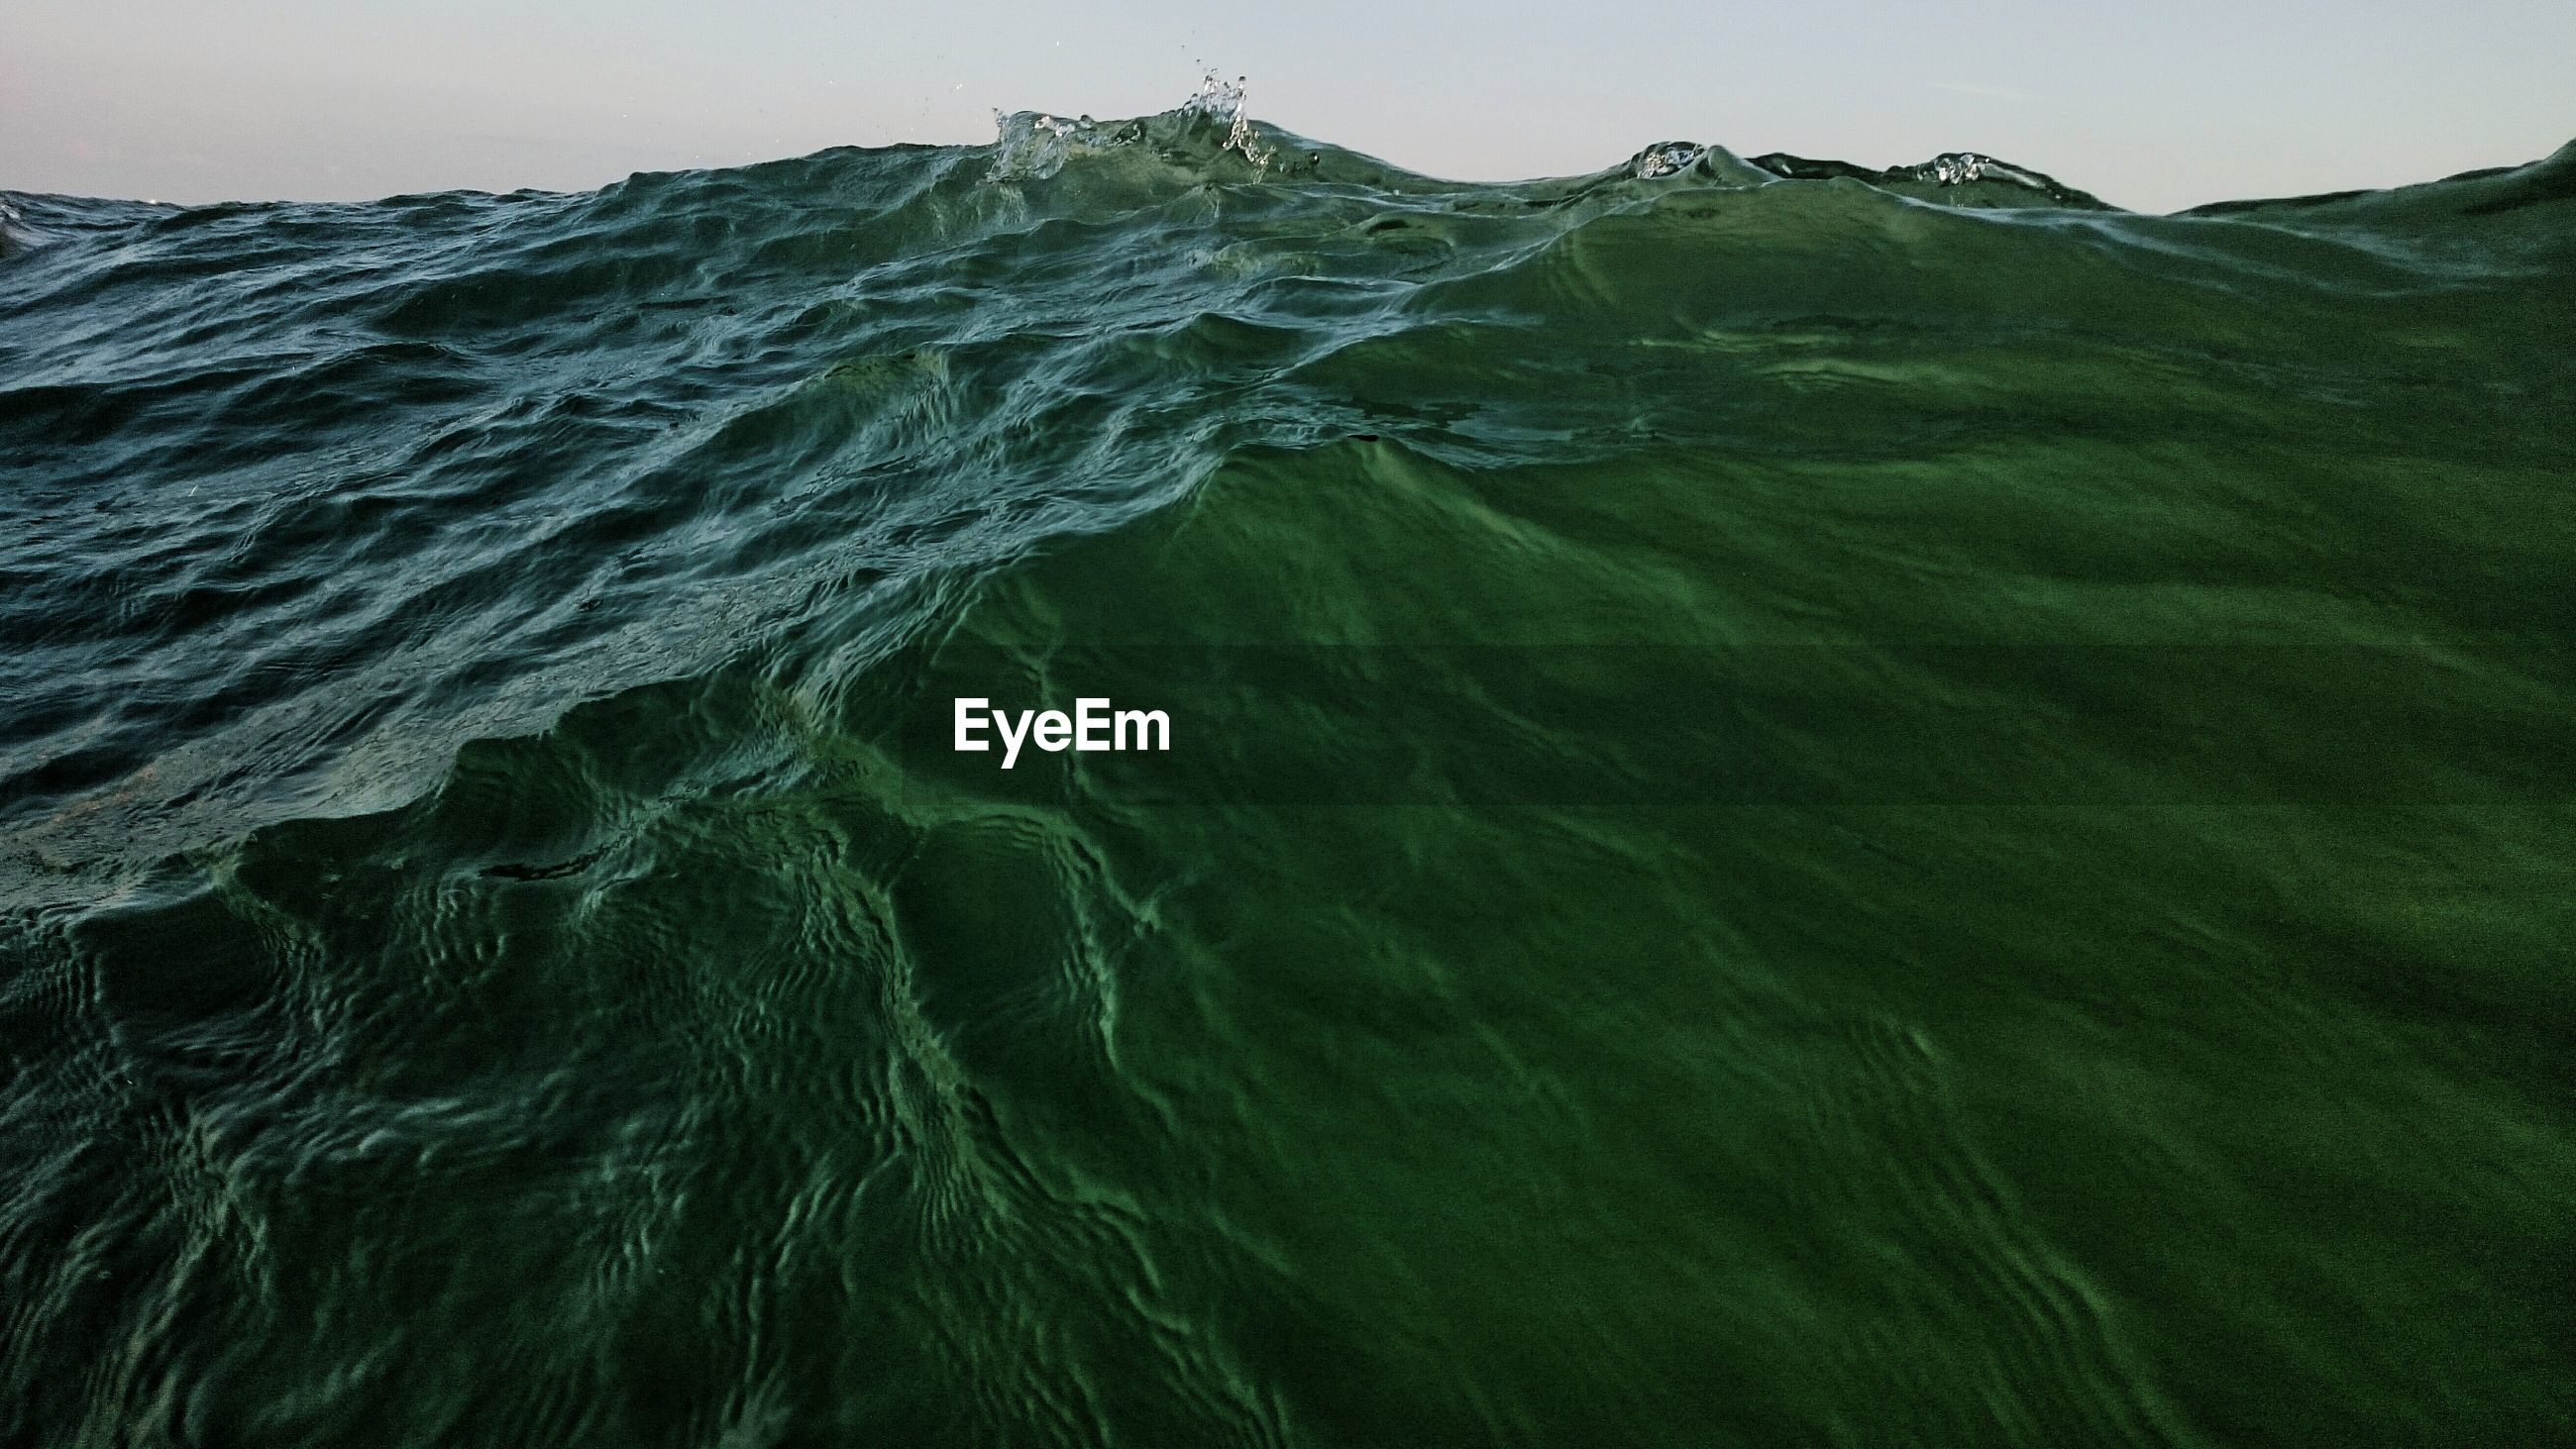 Close-up of sea wave